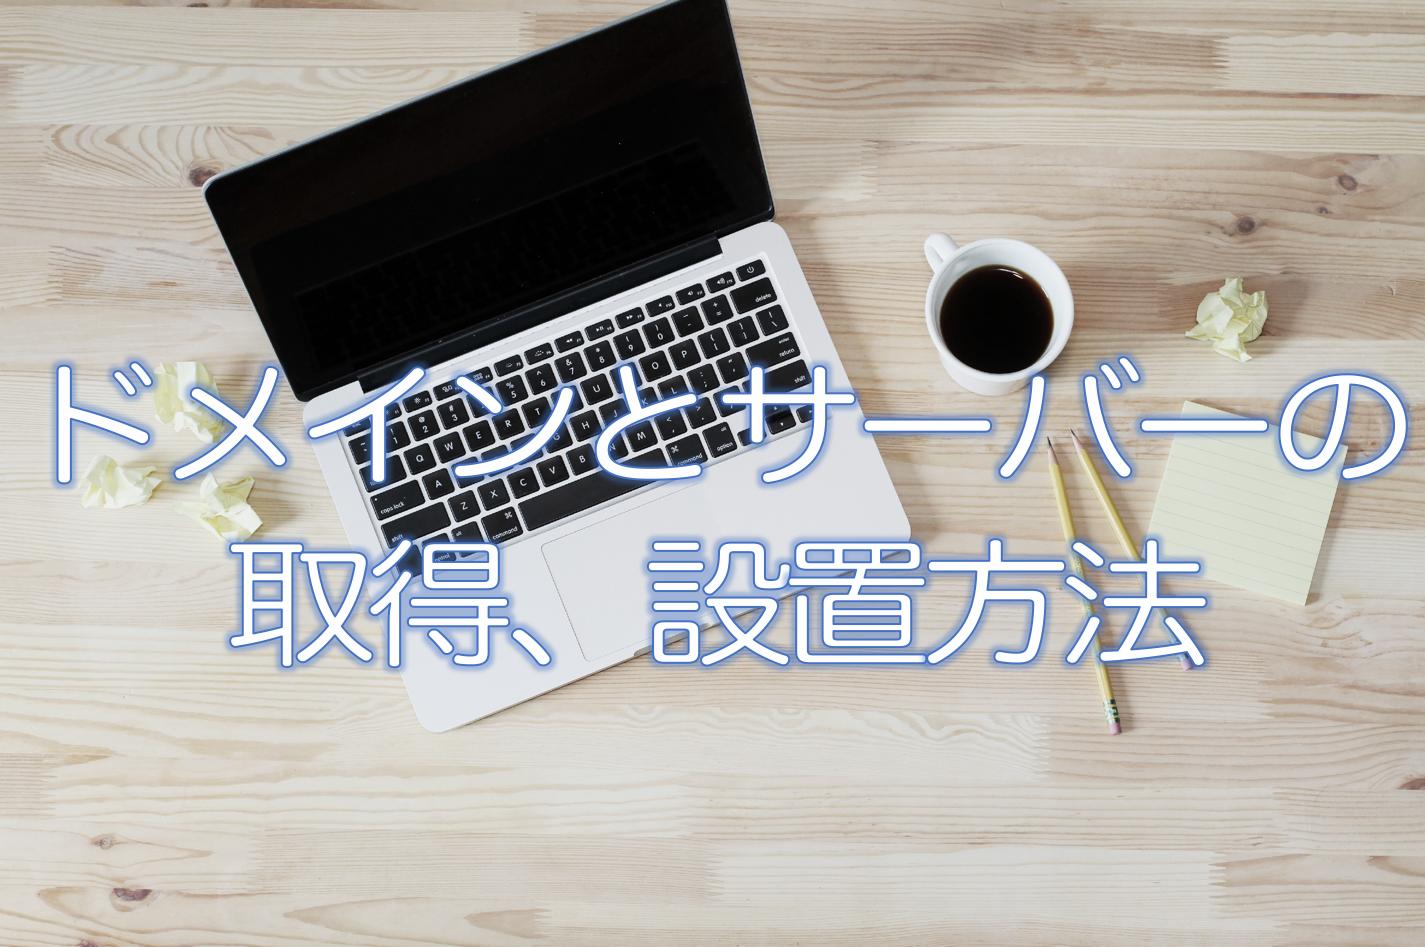 WordPressを始める準備をしよう!ドメインとサーバーの取得、設置方法